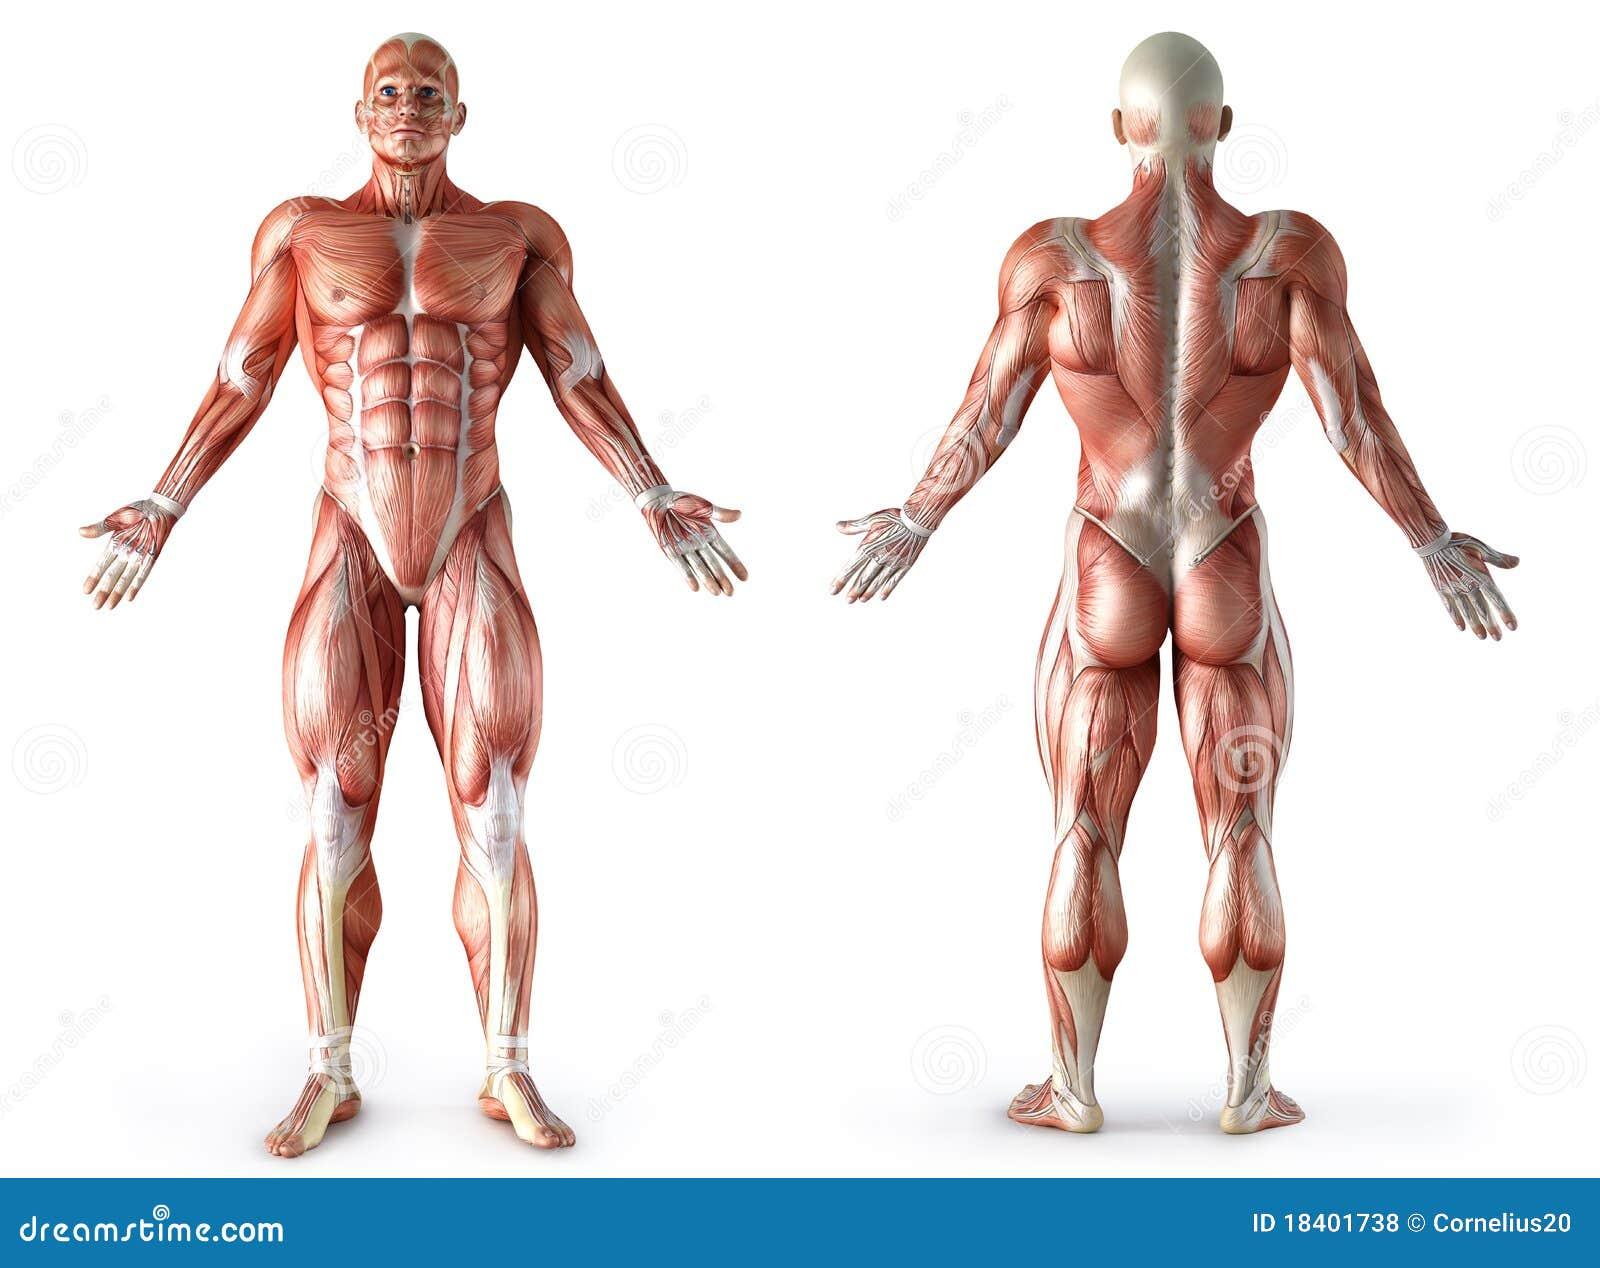 Anatomie Stock Illustrations, Vectors, & Clipart – (100,828 Stock ...